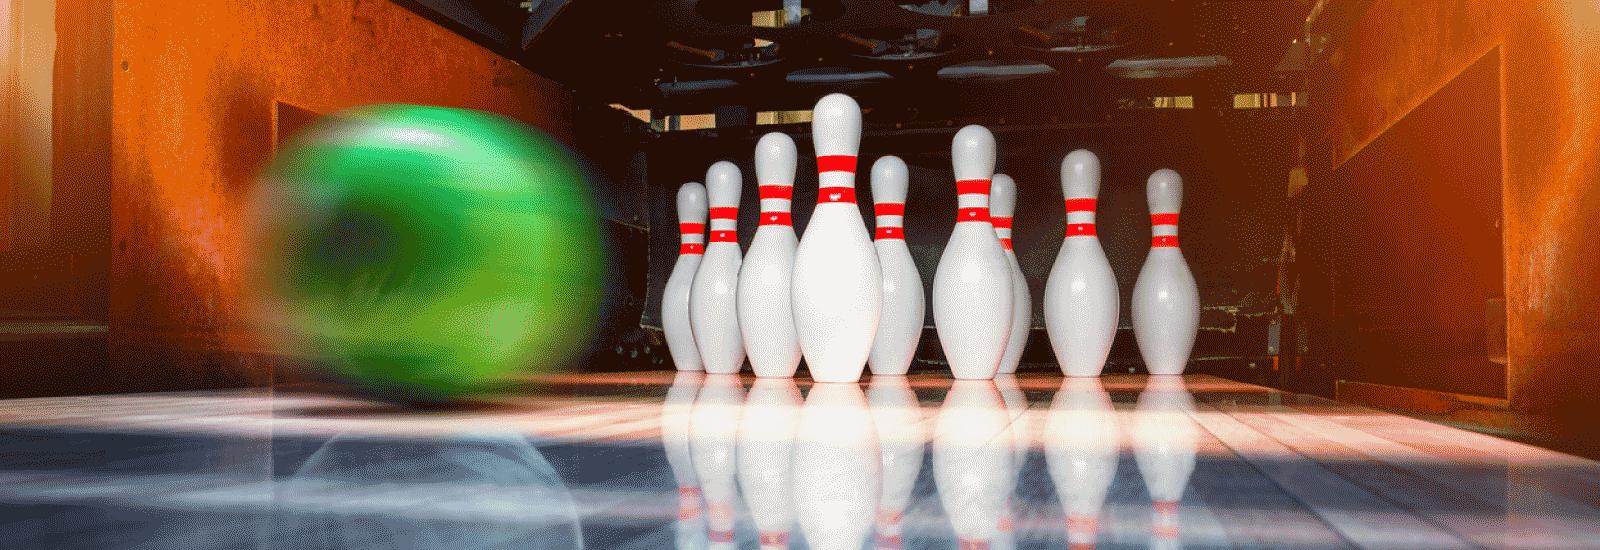 JBLE Bowling Alleys